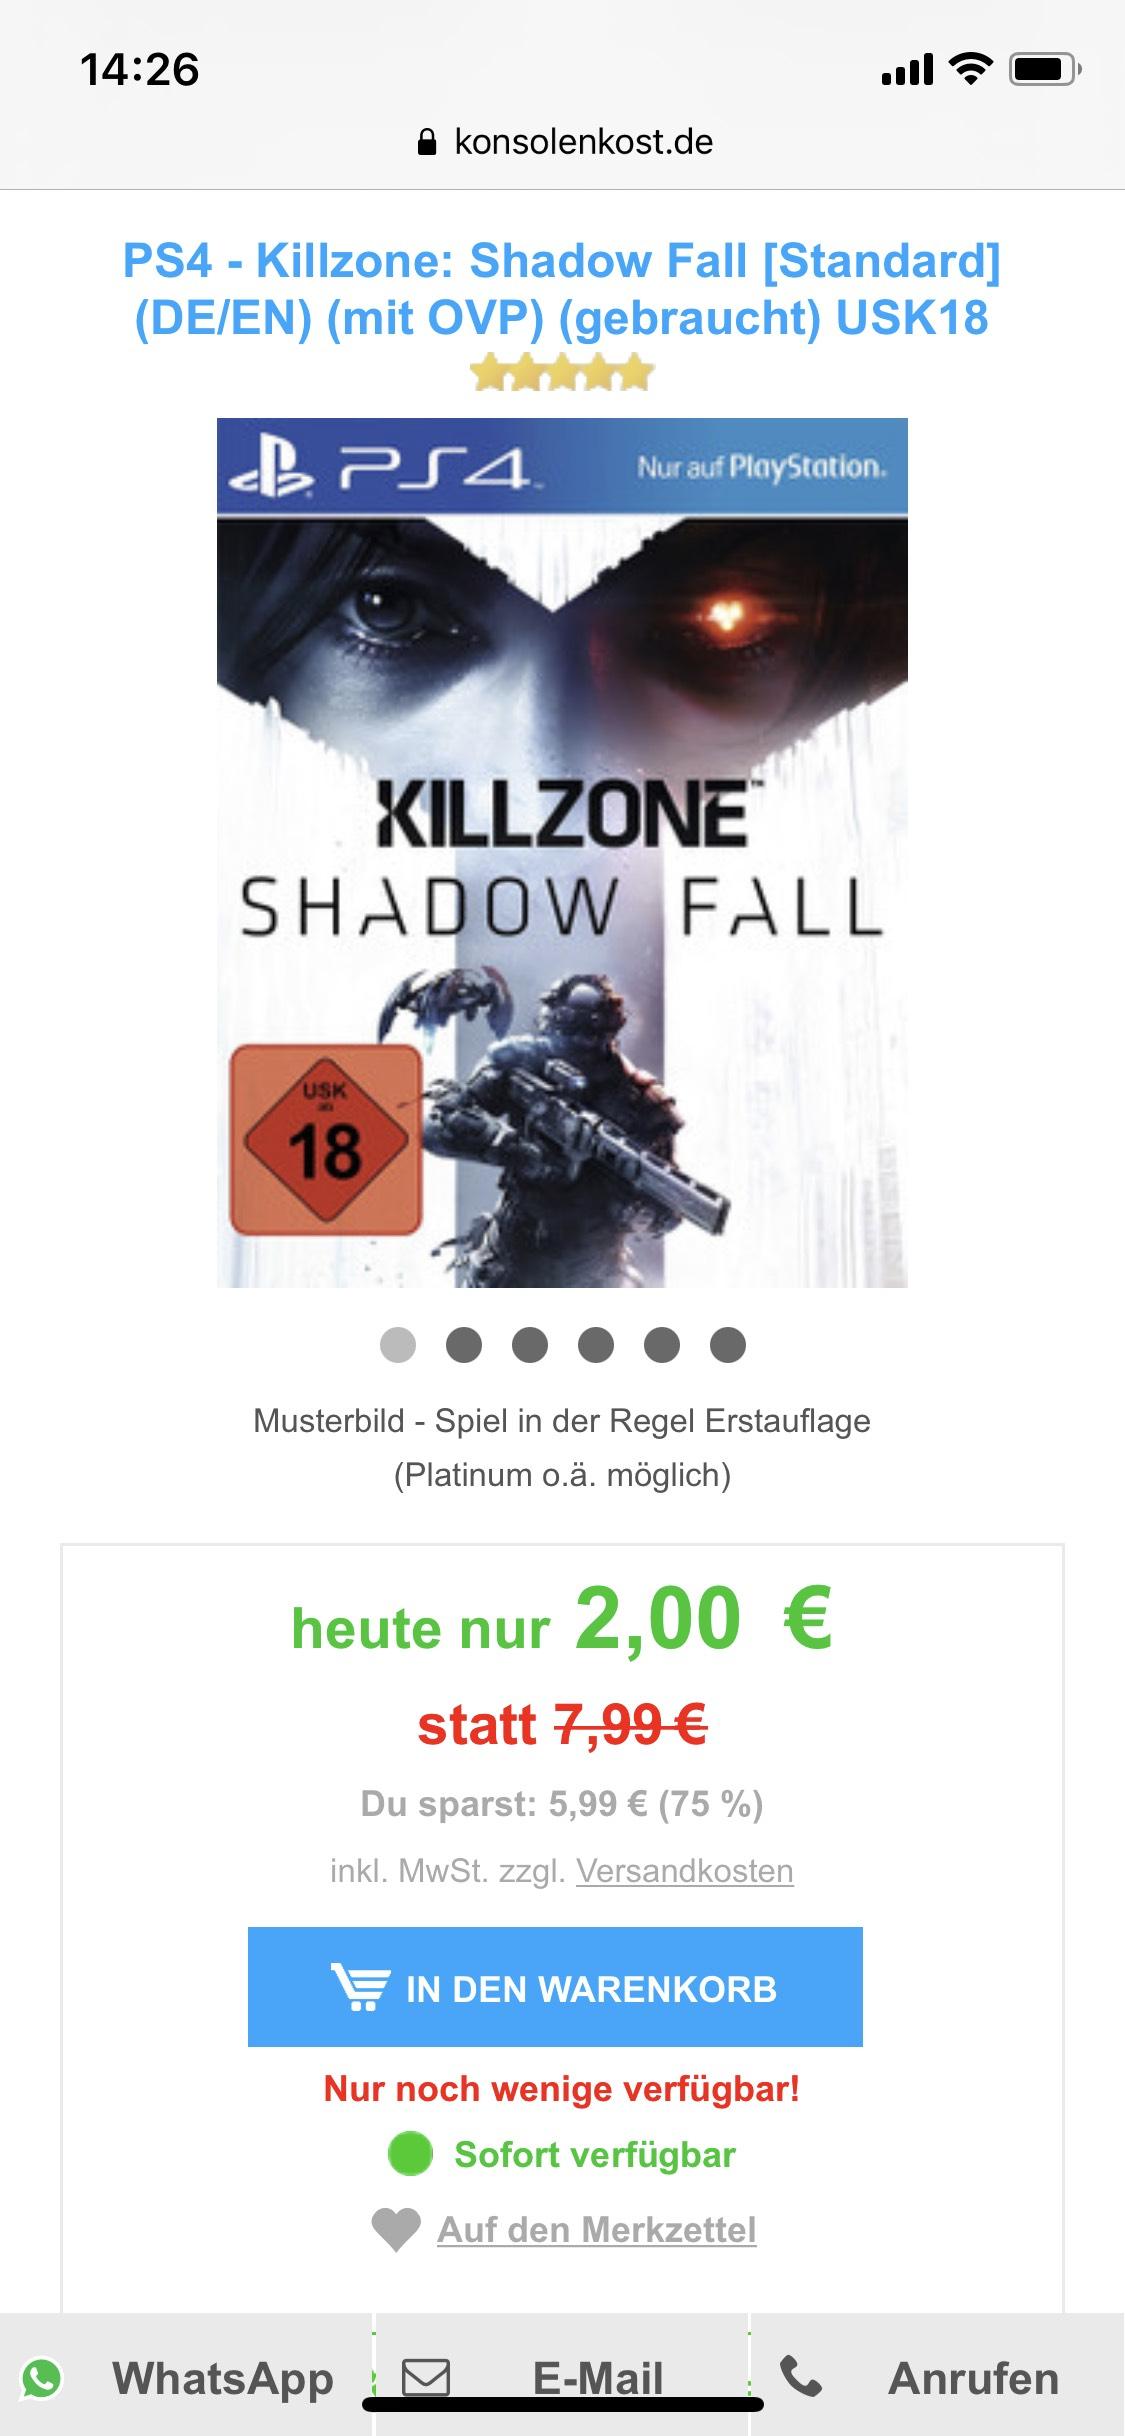 PS4 - Killzone: Shadow Fall (DE/EN) (mit OVP) (gebraucht) USK18 PlayStation 4